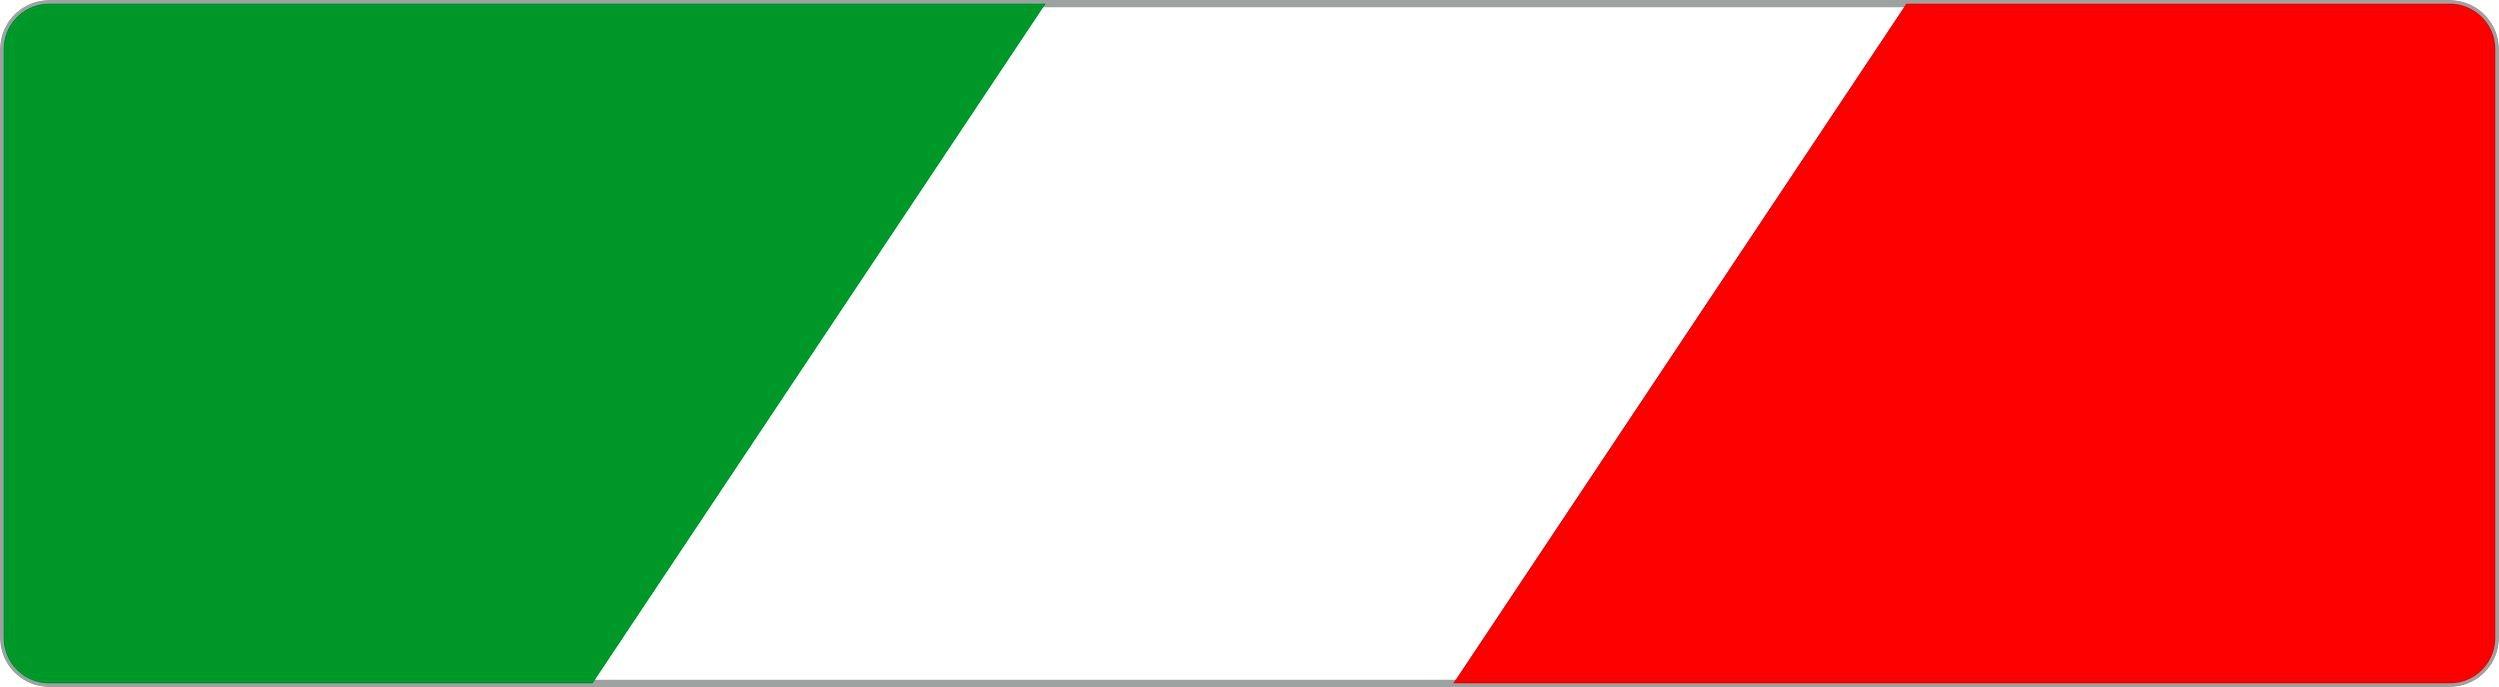 Aufkleber Italien Flagge Dimension 15 x 55 mm  – Bild 1